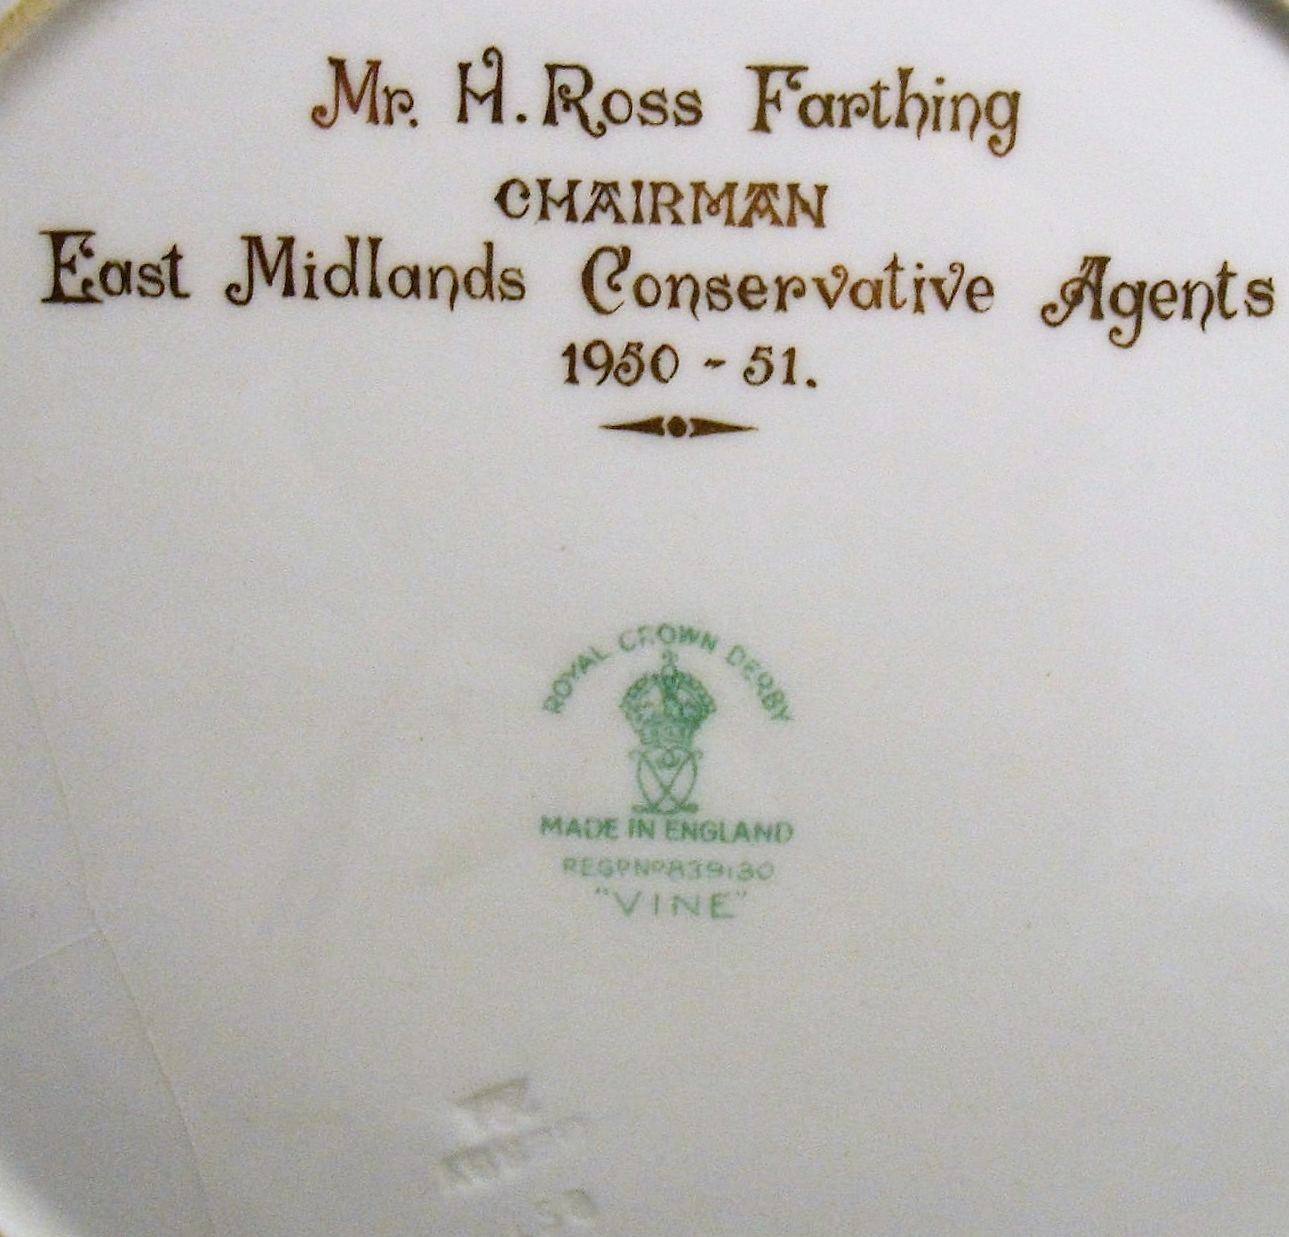 royal-crown-derby-vine-maroon-garnett-h-ross-farthing-A937-mark-and-inscription